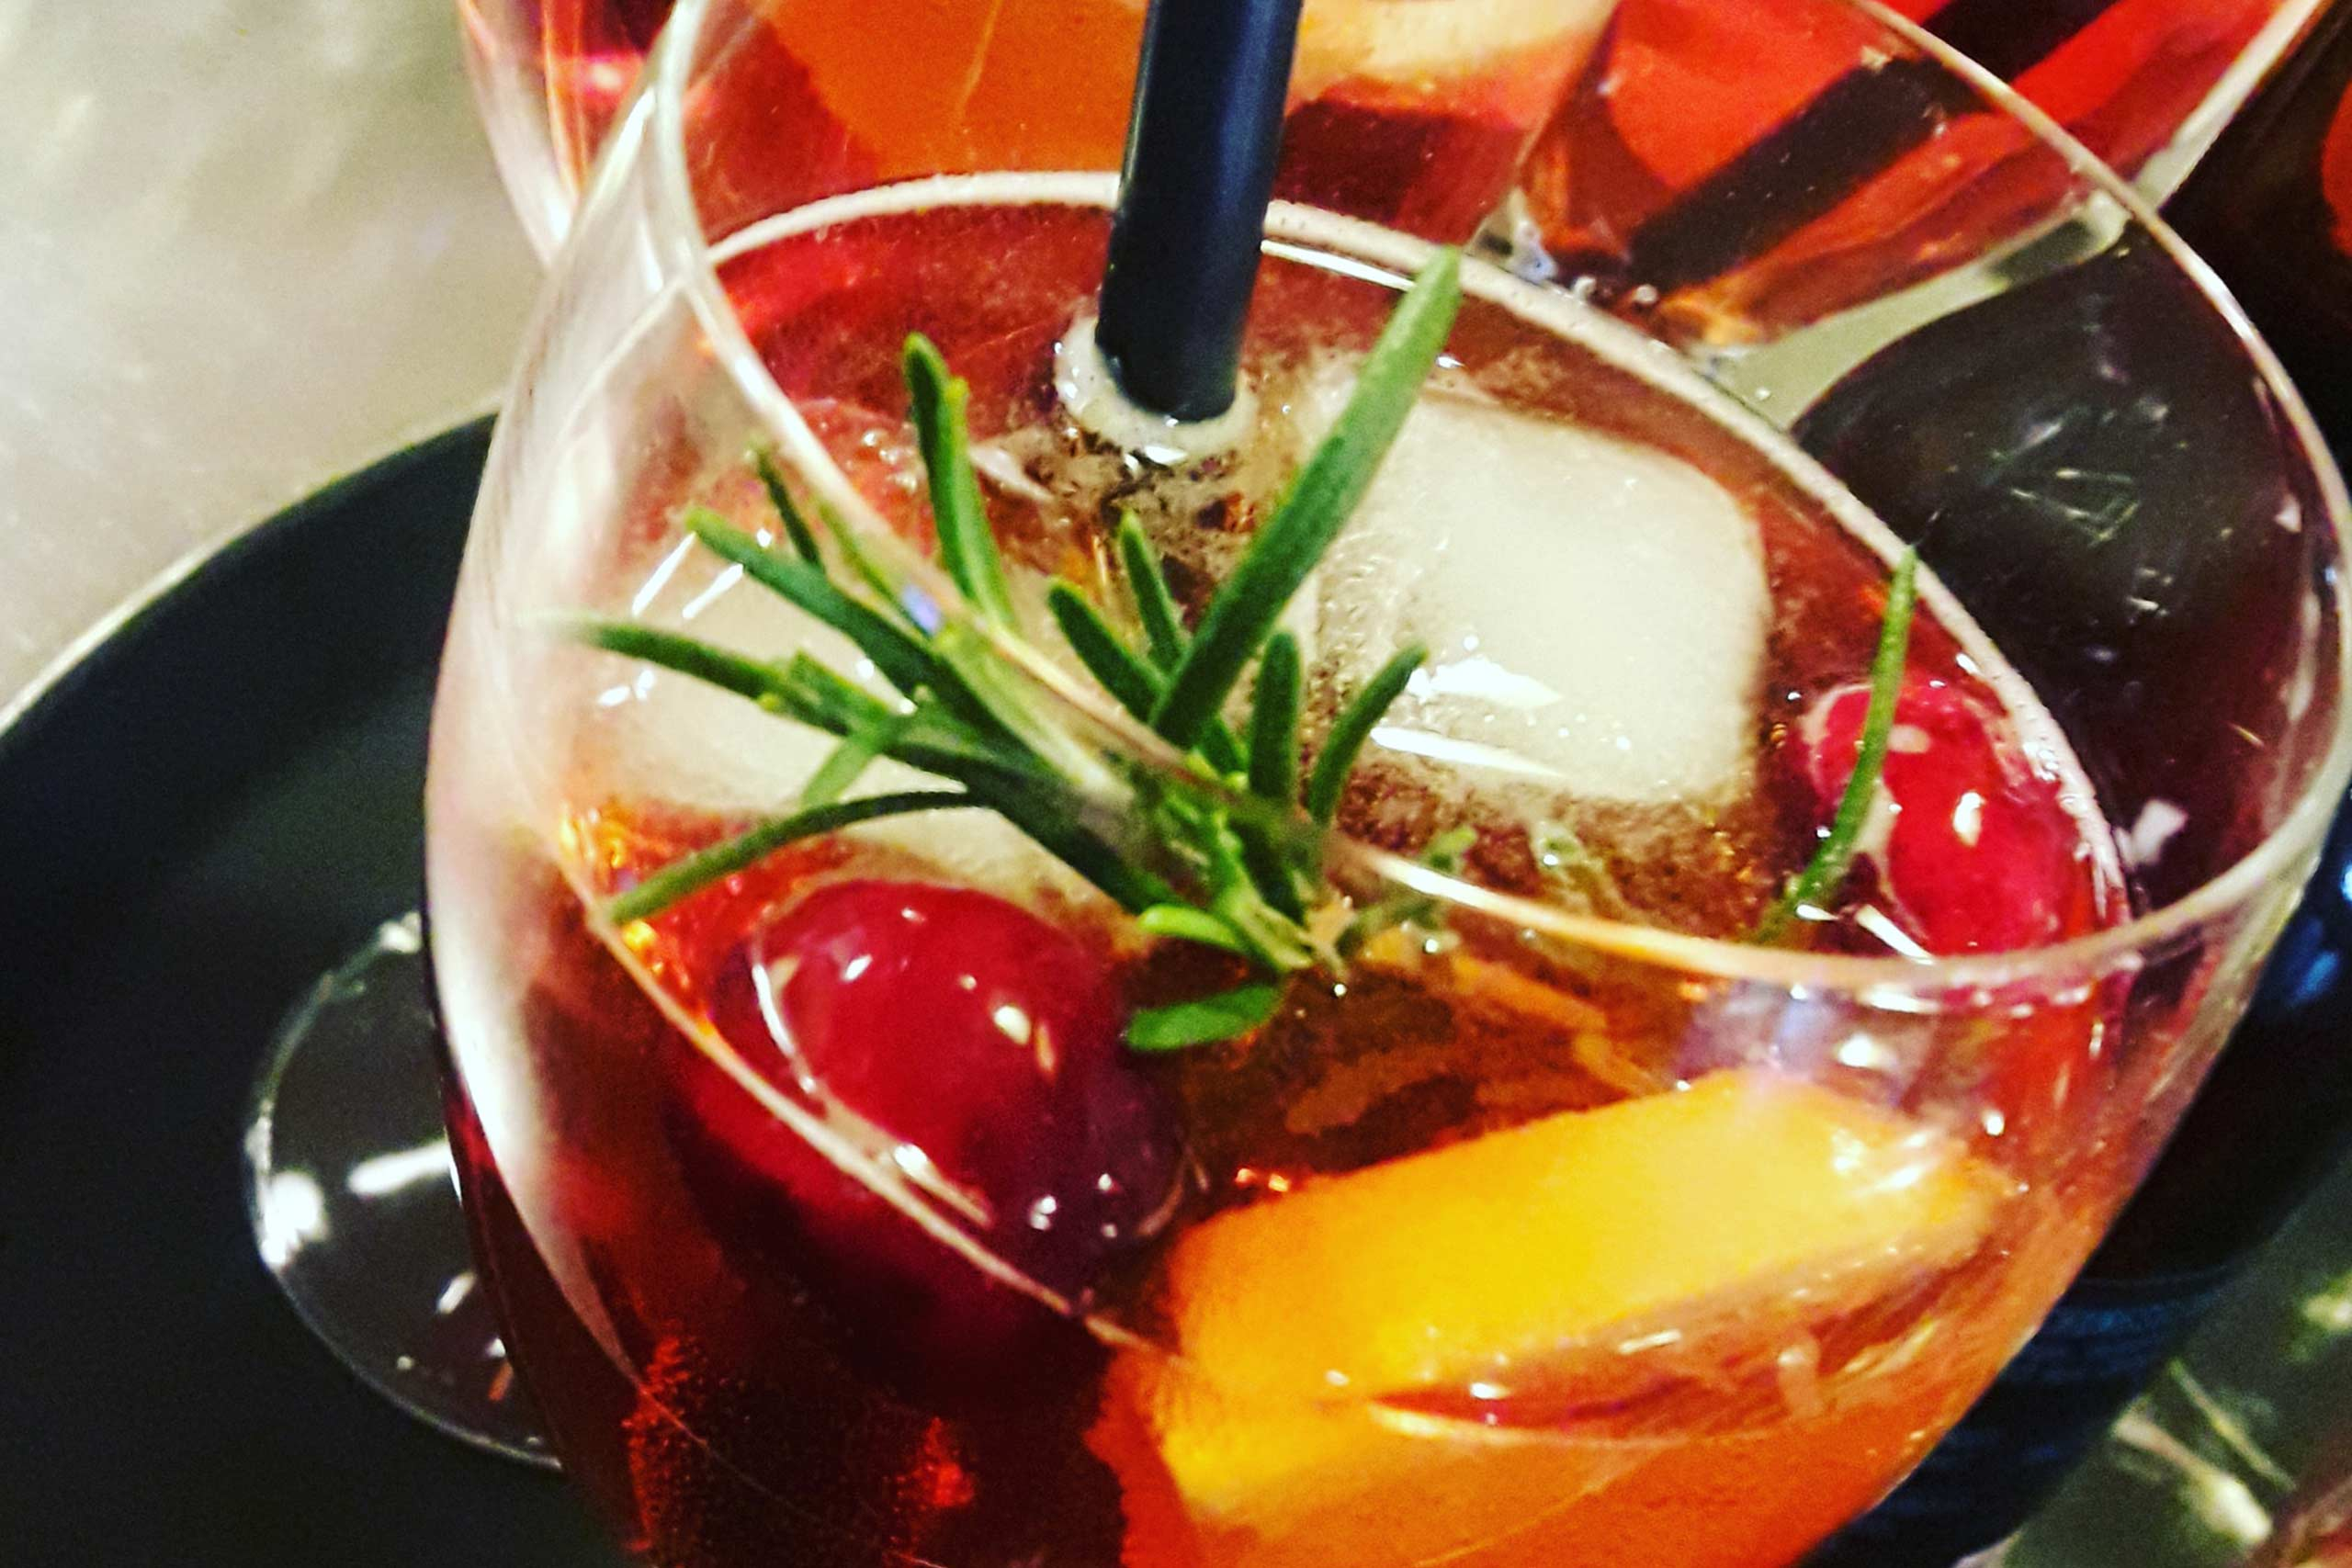 cafe-baeretatze-cocktail.jpg